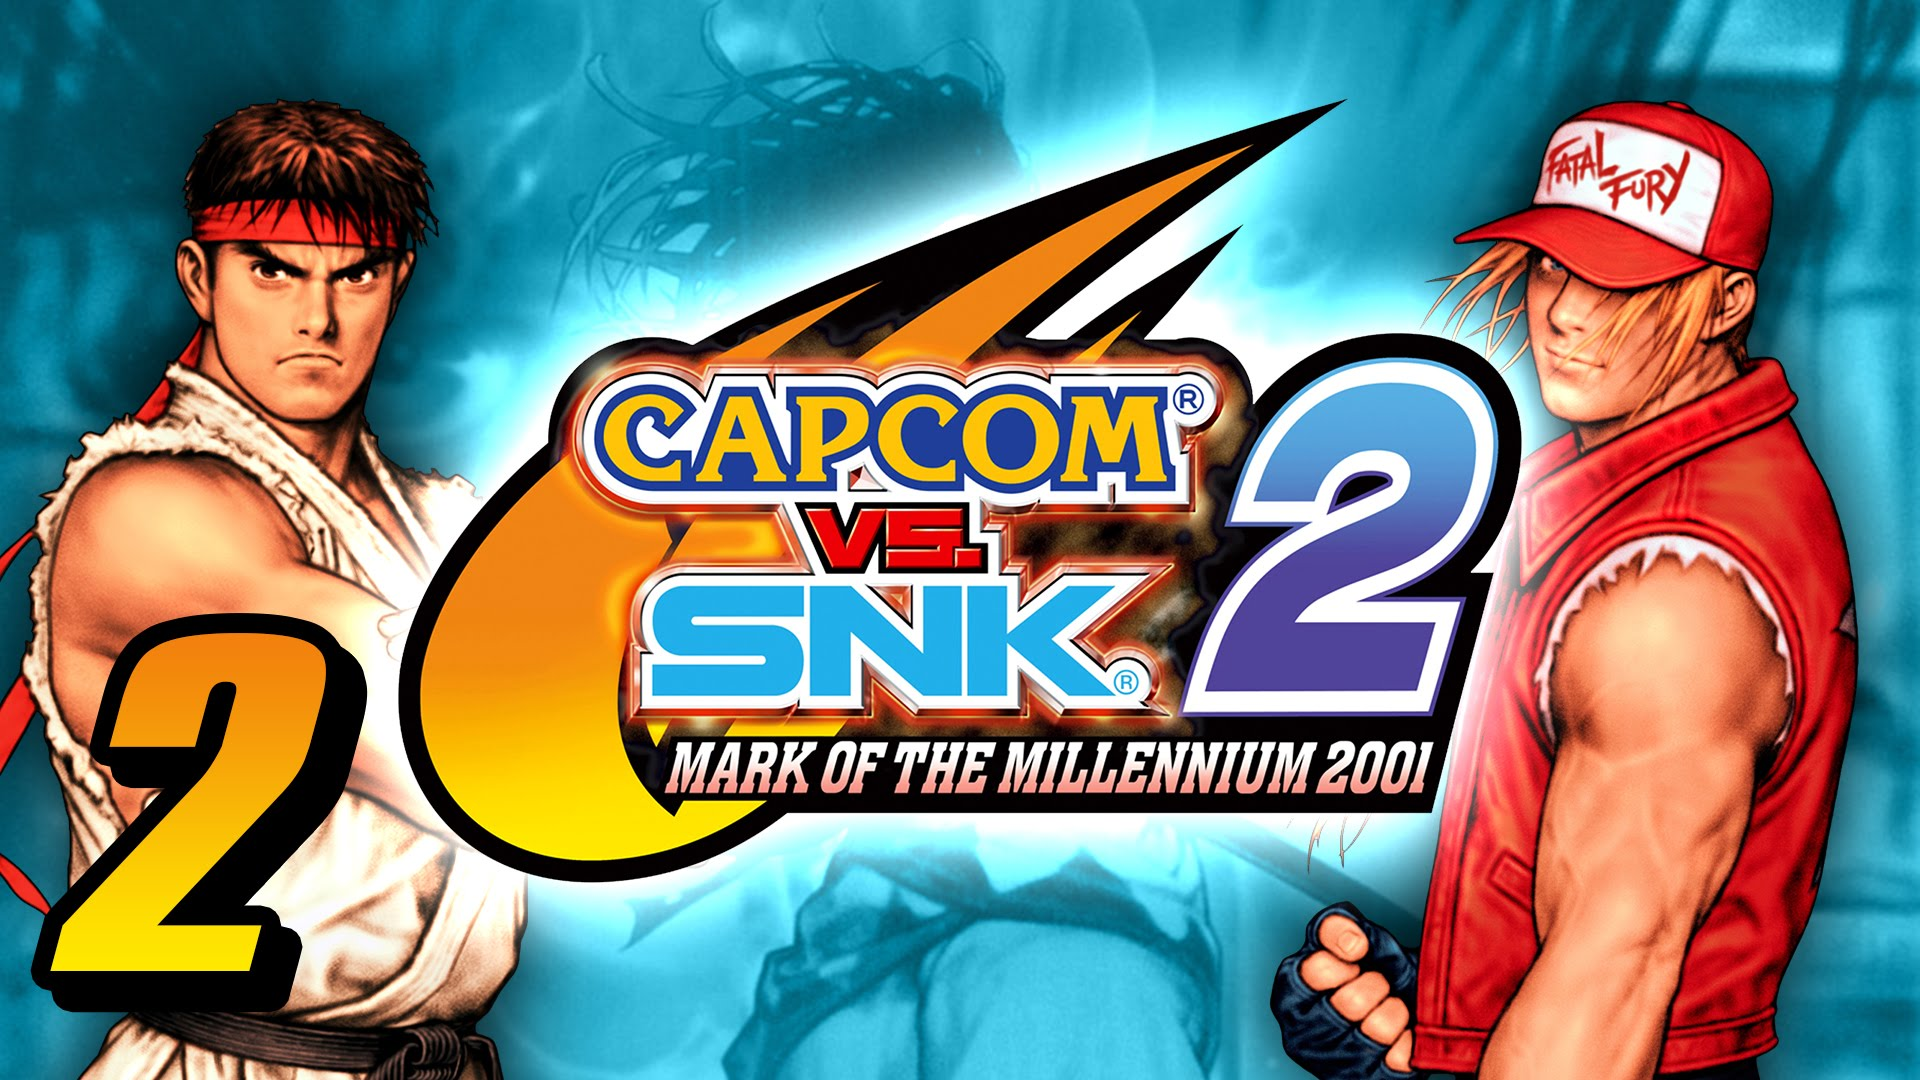 Most Viewed Capcom Vs Snk 2 Eo Wallpapers 4k Wallpapers